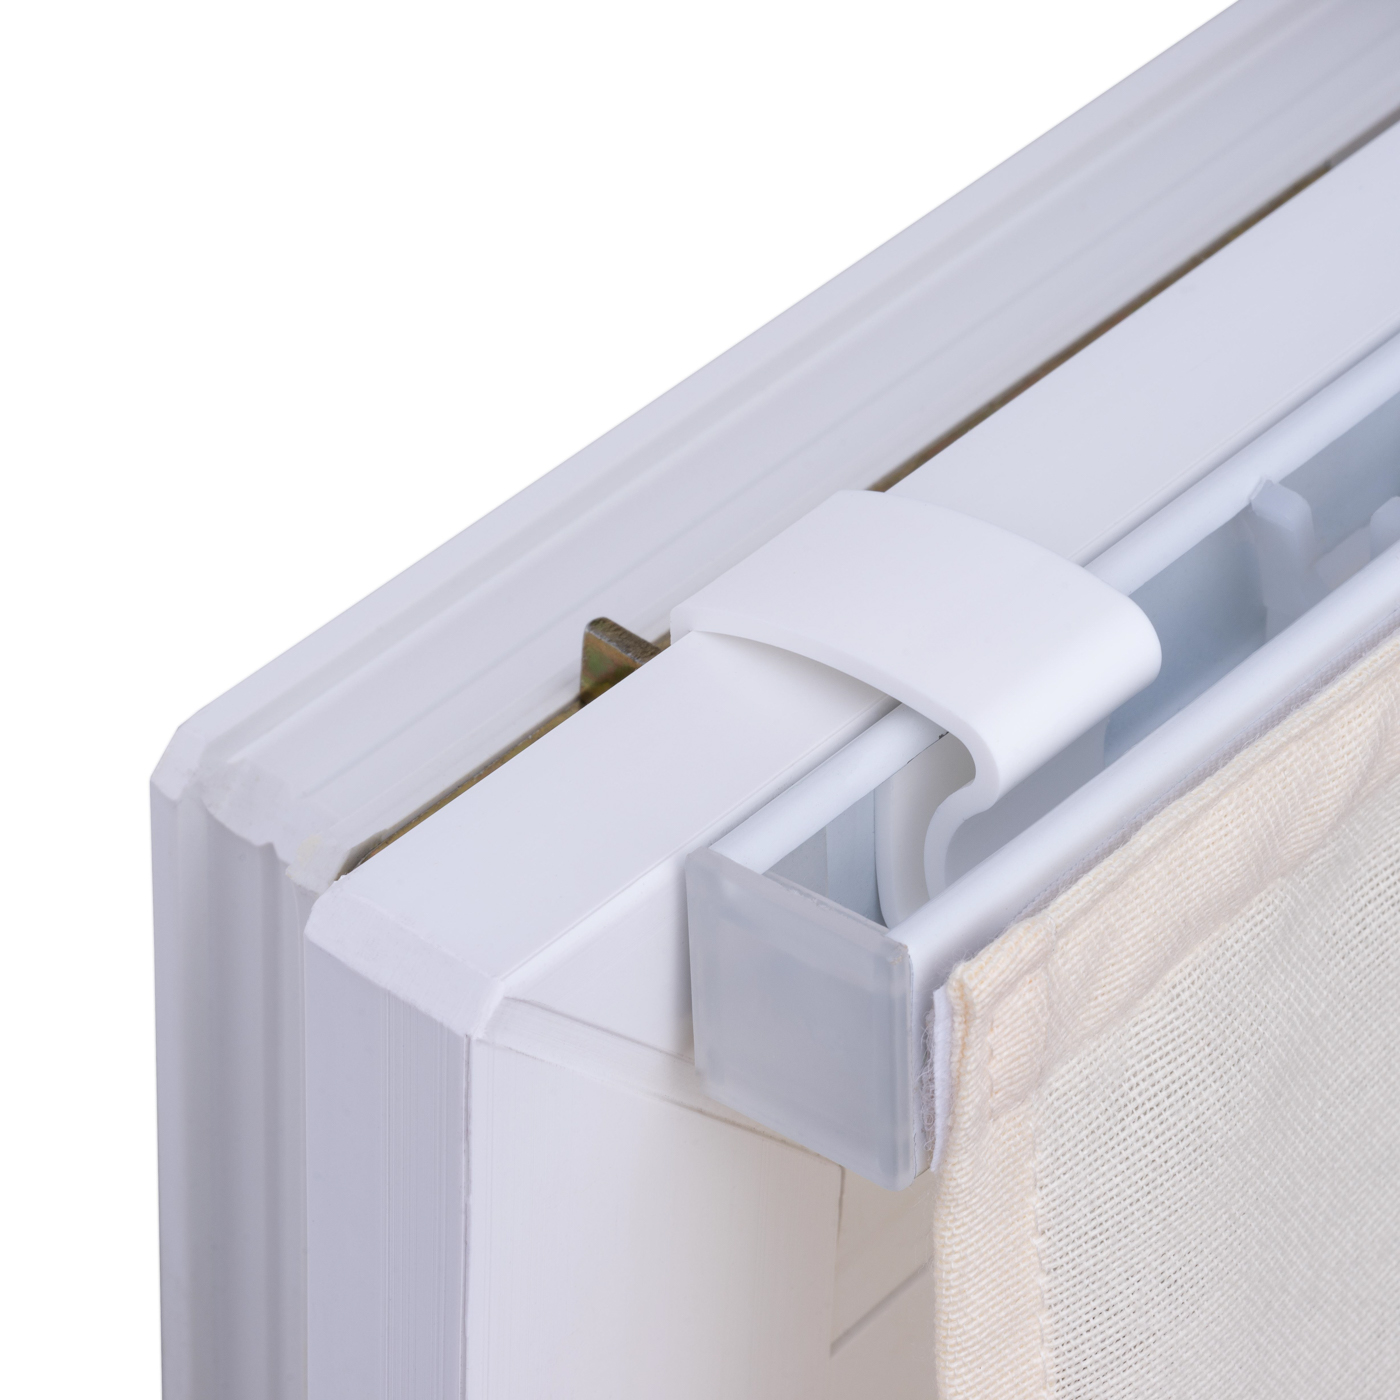 raffrollo klemmfix beige raffgardine fenster faltrollo rollo gardine ebay. Black Bedroom Furniture Sets. Home Design Ideas